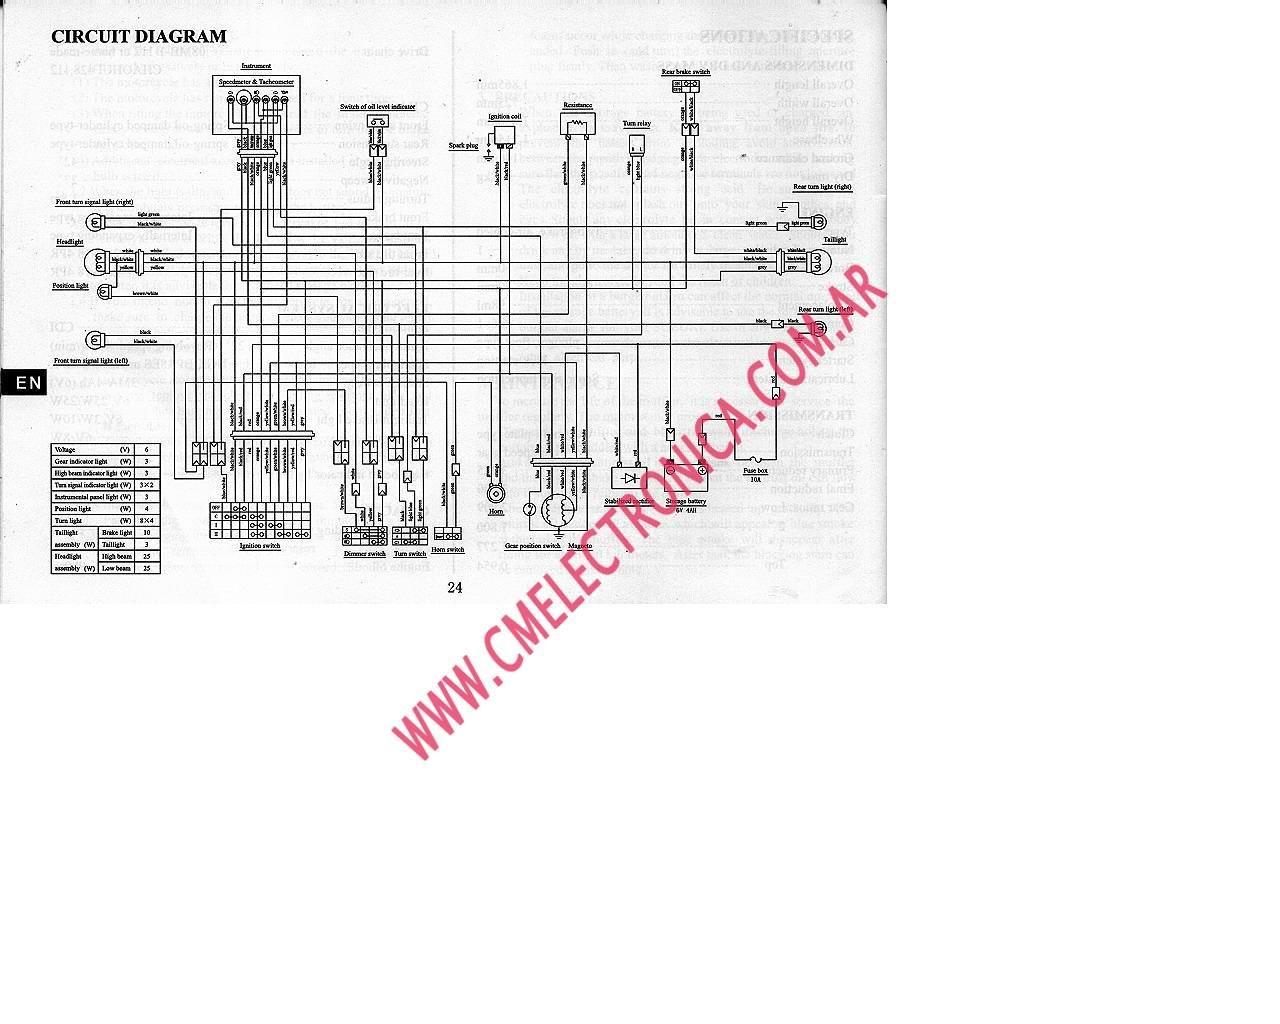 Plano Electrico Ax 100 Suzuki Montajes Eléctricos Circuit Diagram Circuit Diagram